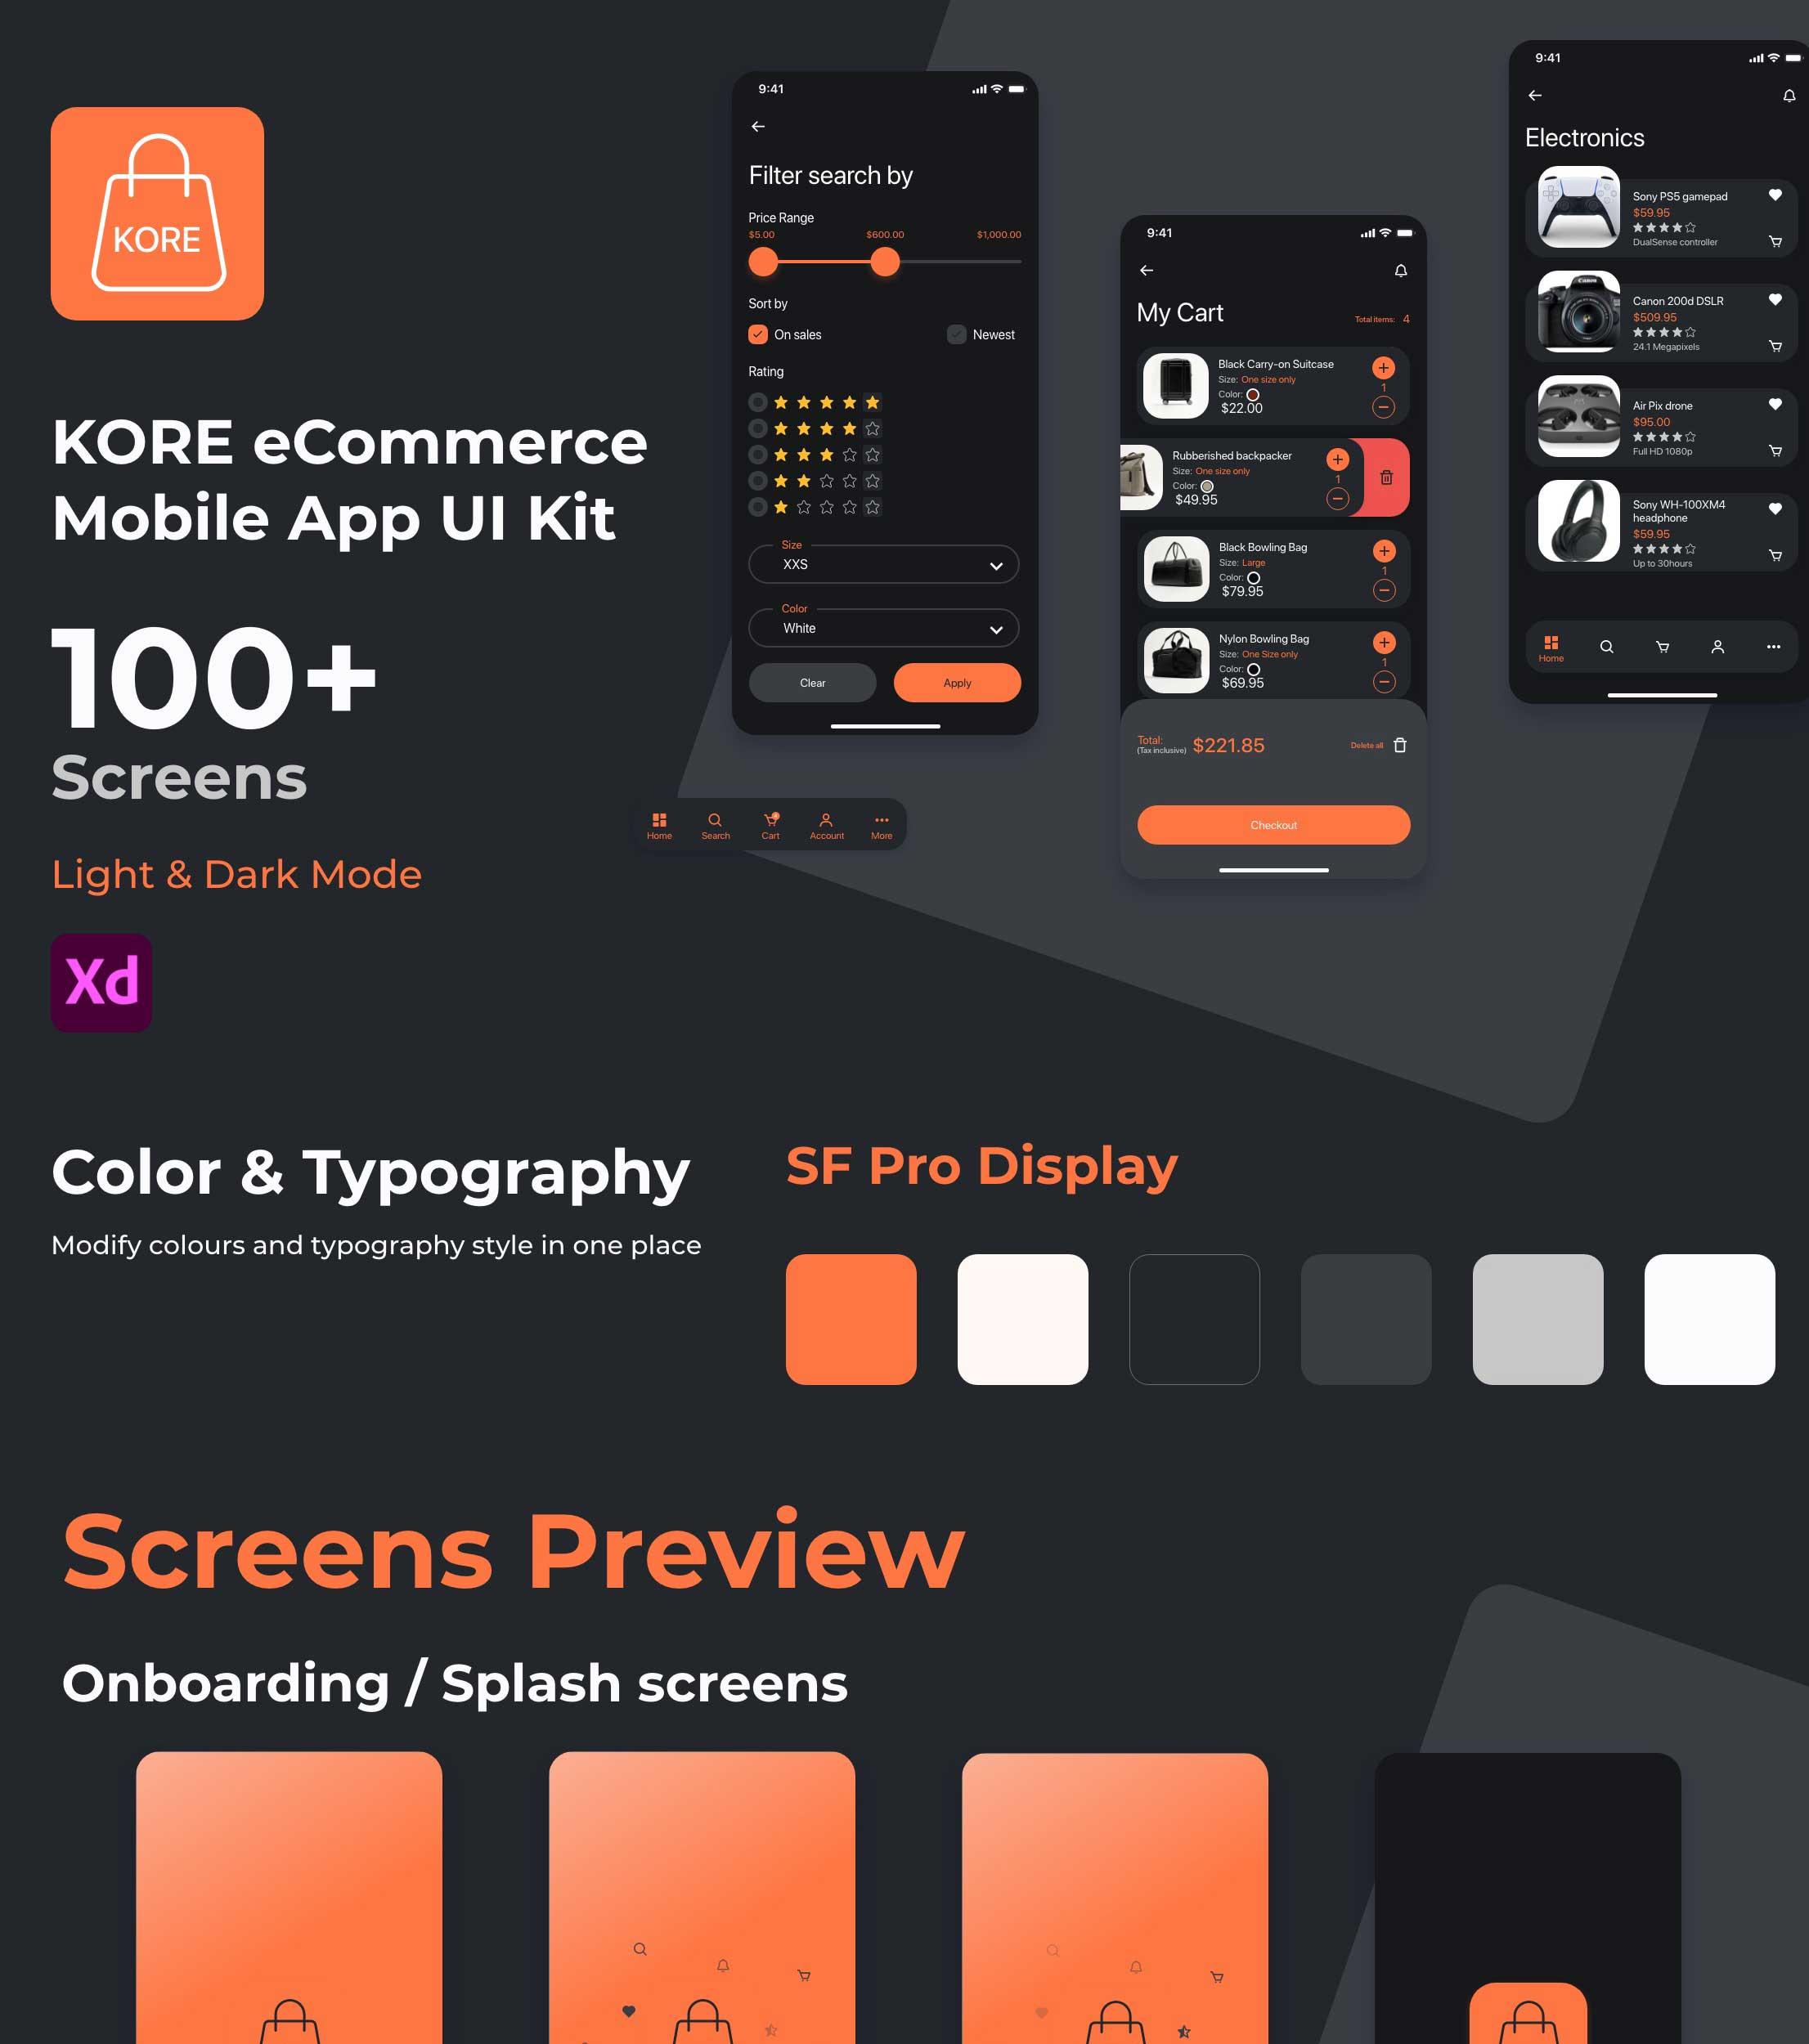 kore_app_ui_kit dark theme a